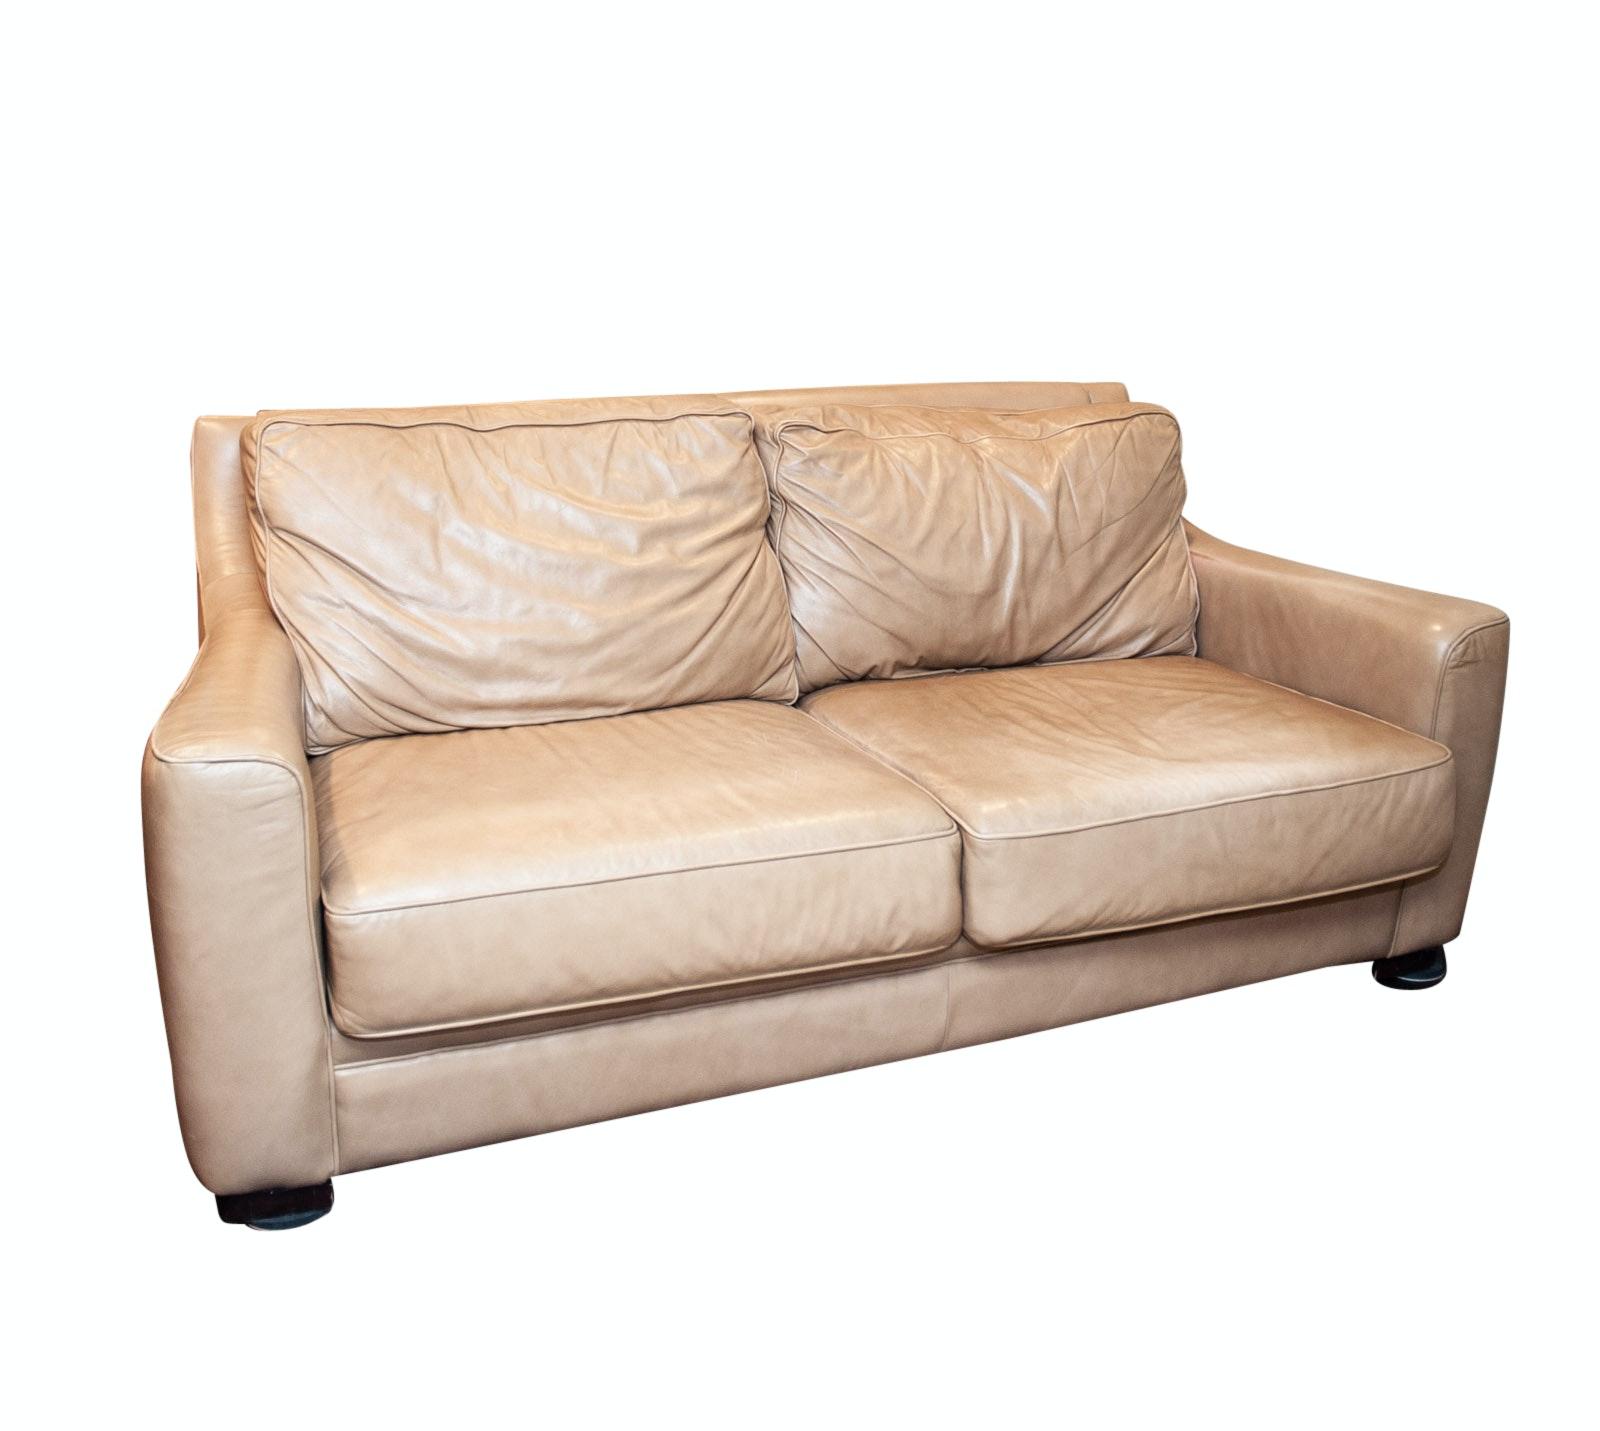 Sofa Express Tan Leather Sofa